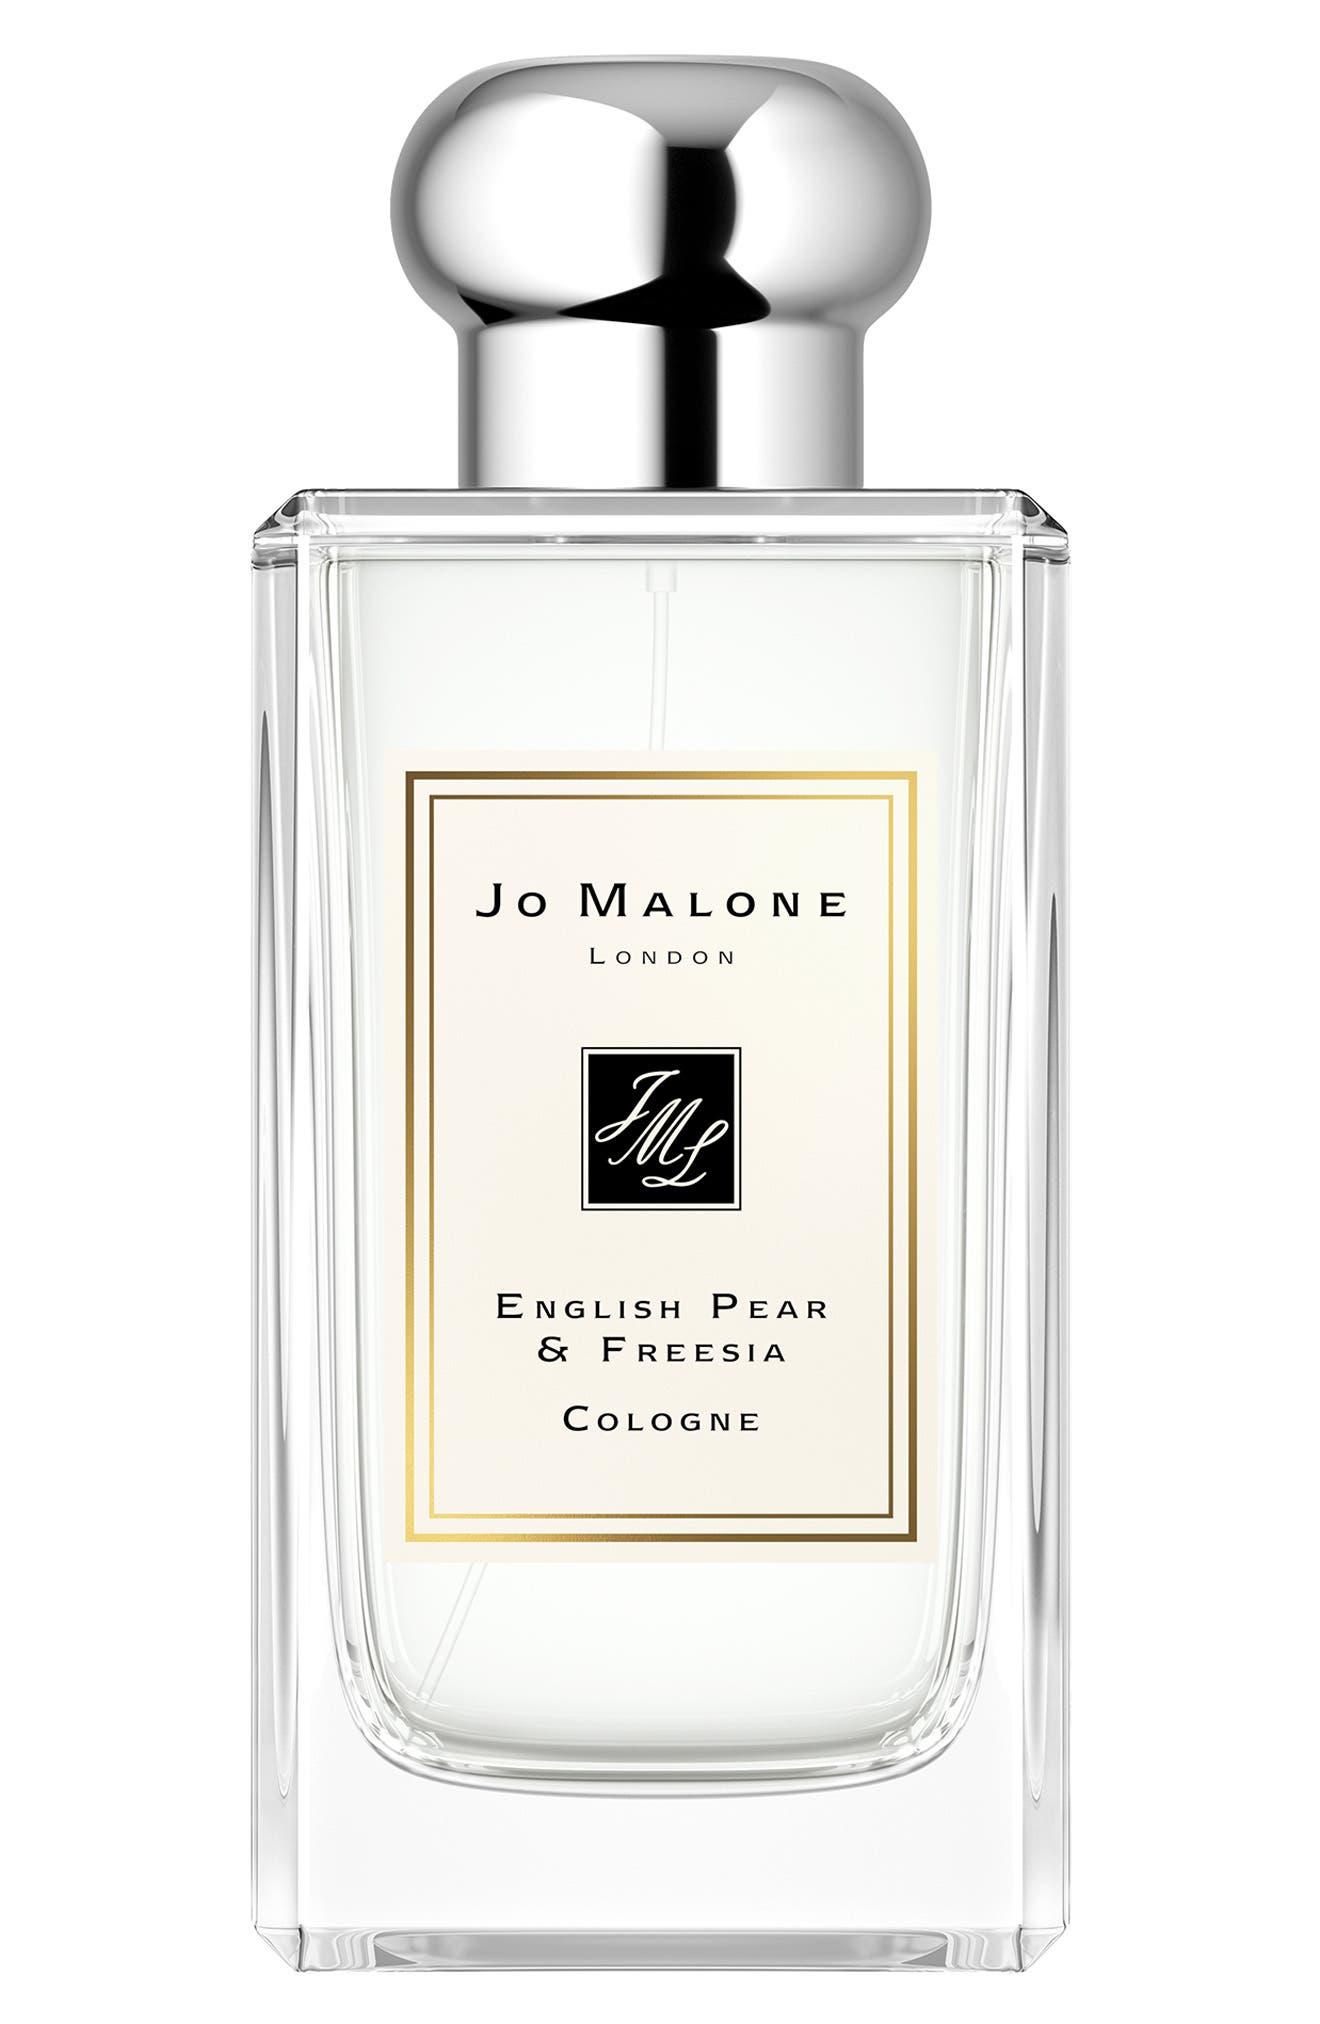 Jo Malone London(TM) English Pear & Freesia Cologne